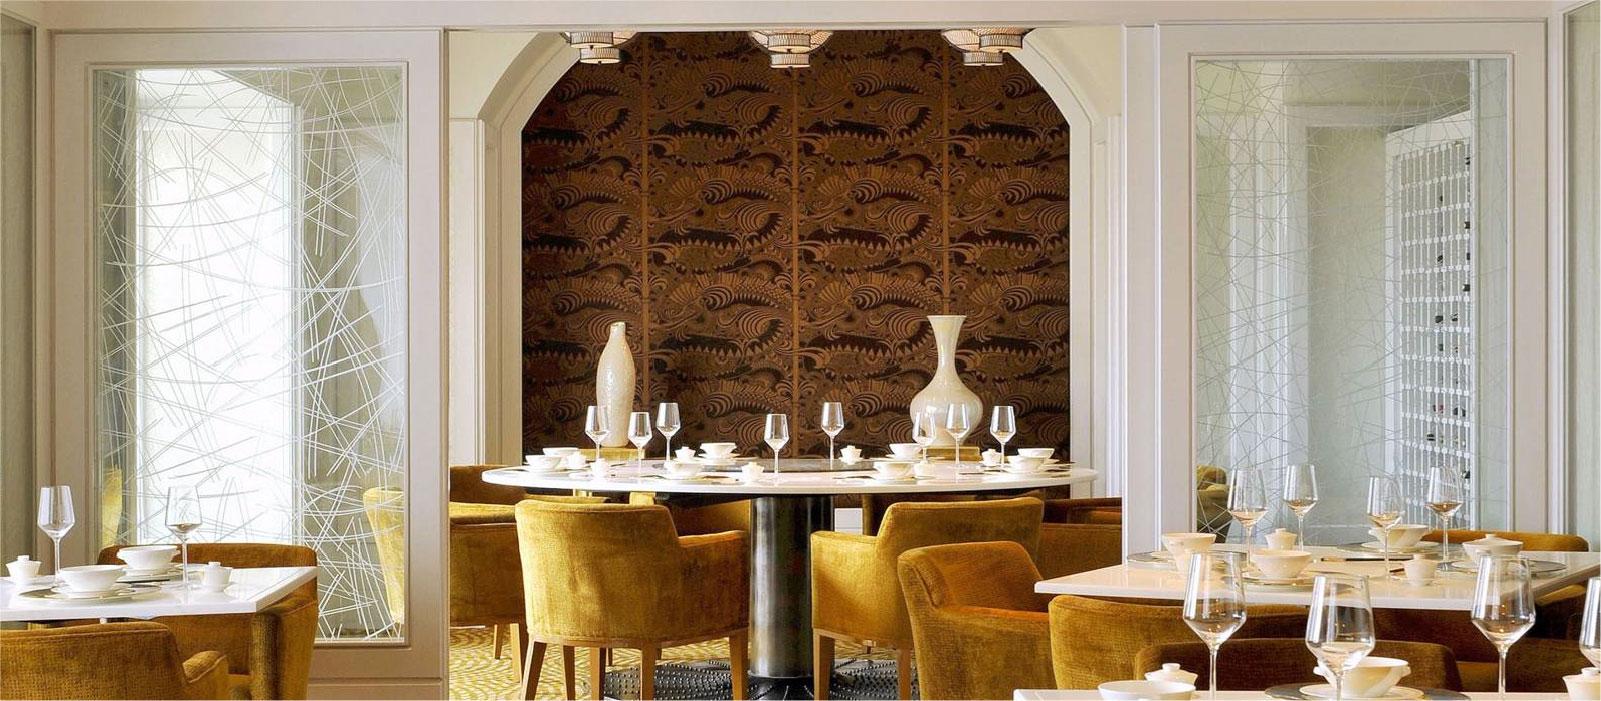 ICONIC HOTELS -